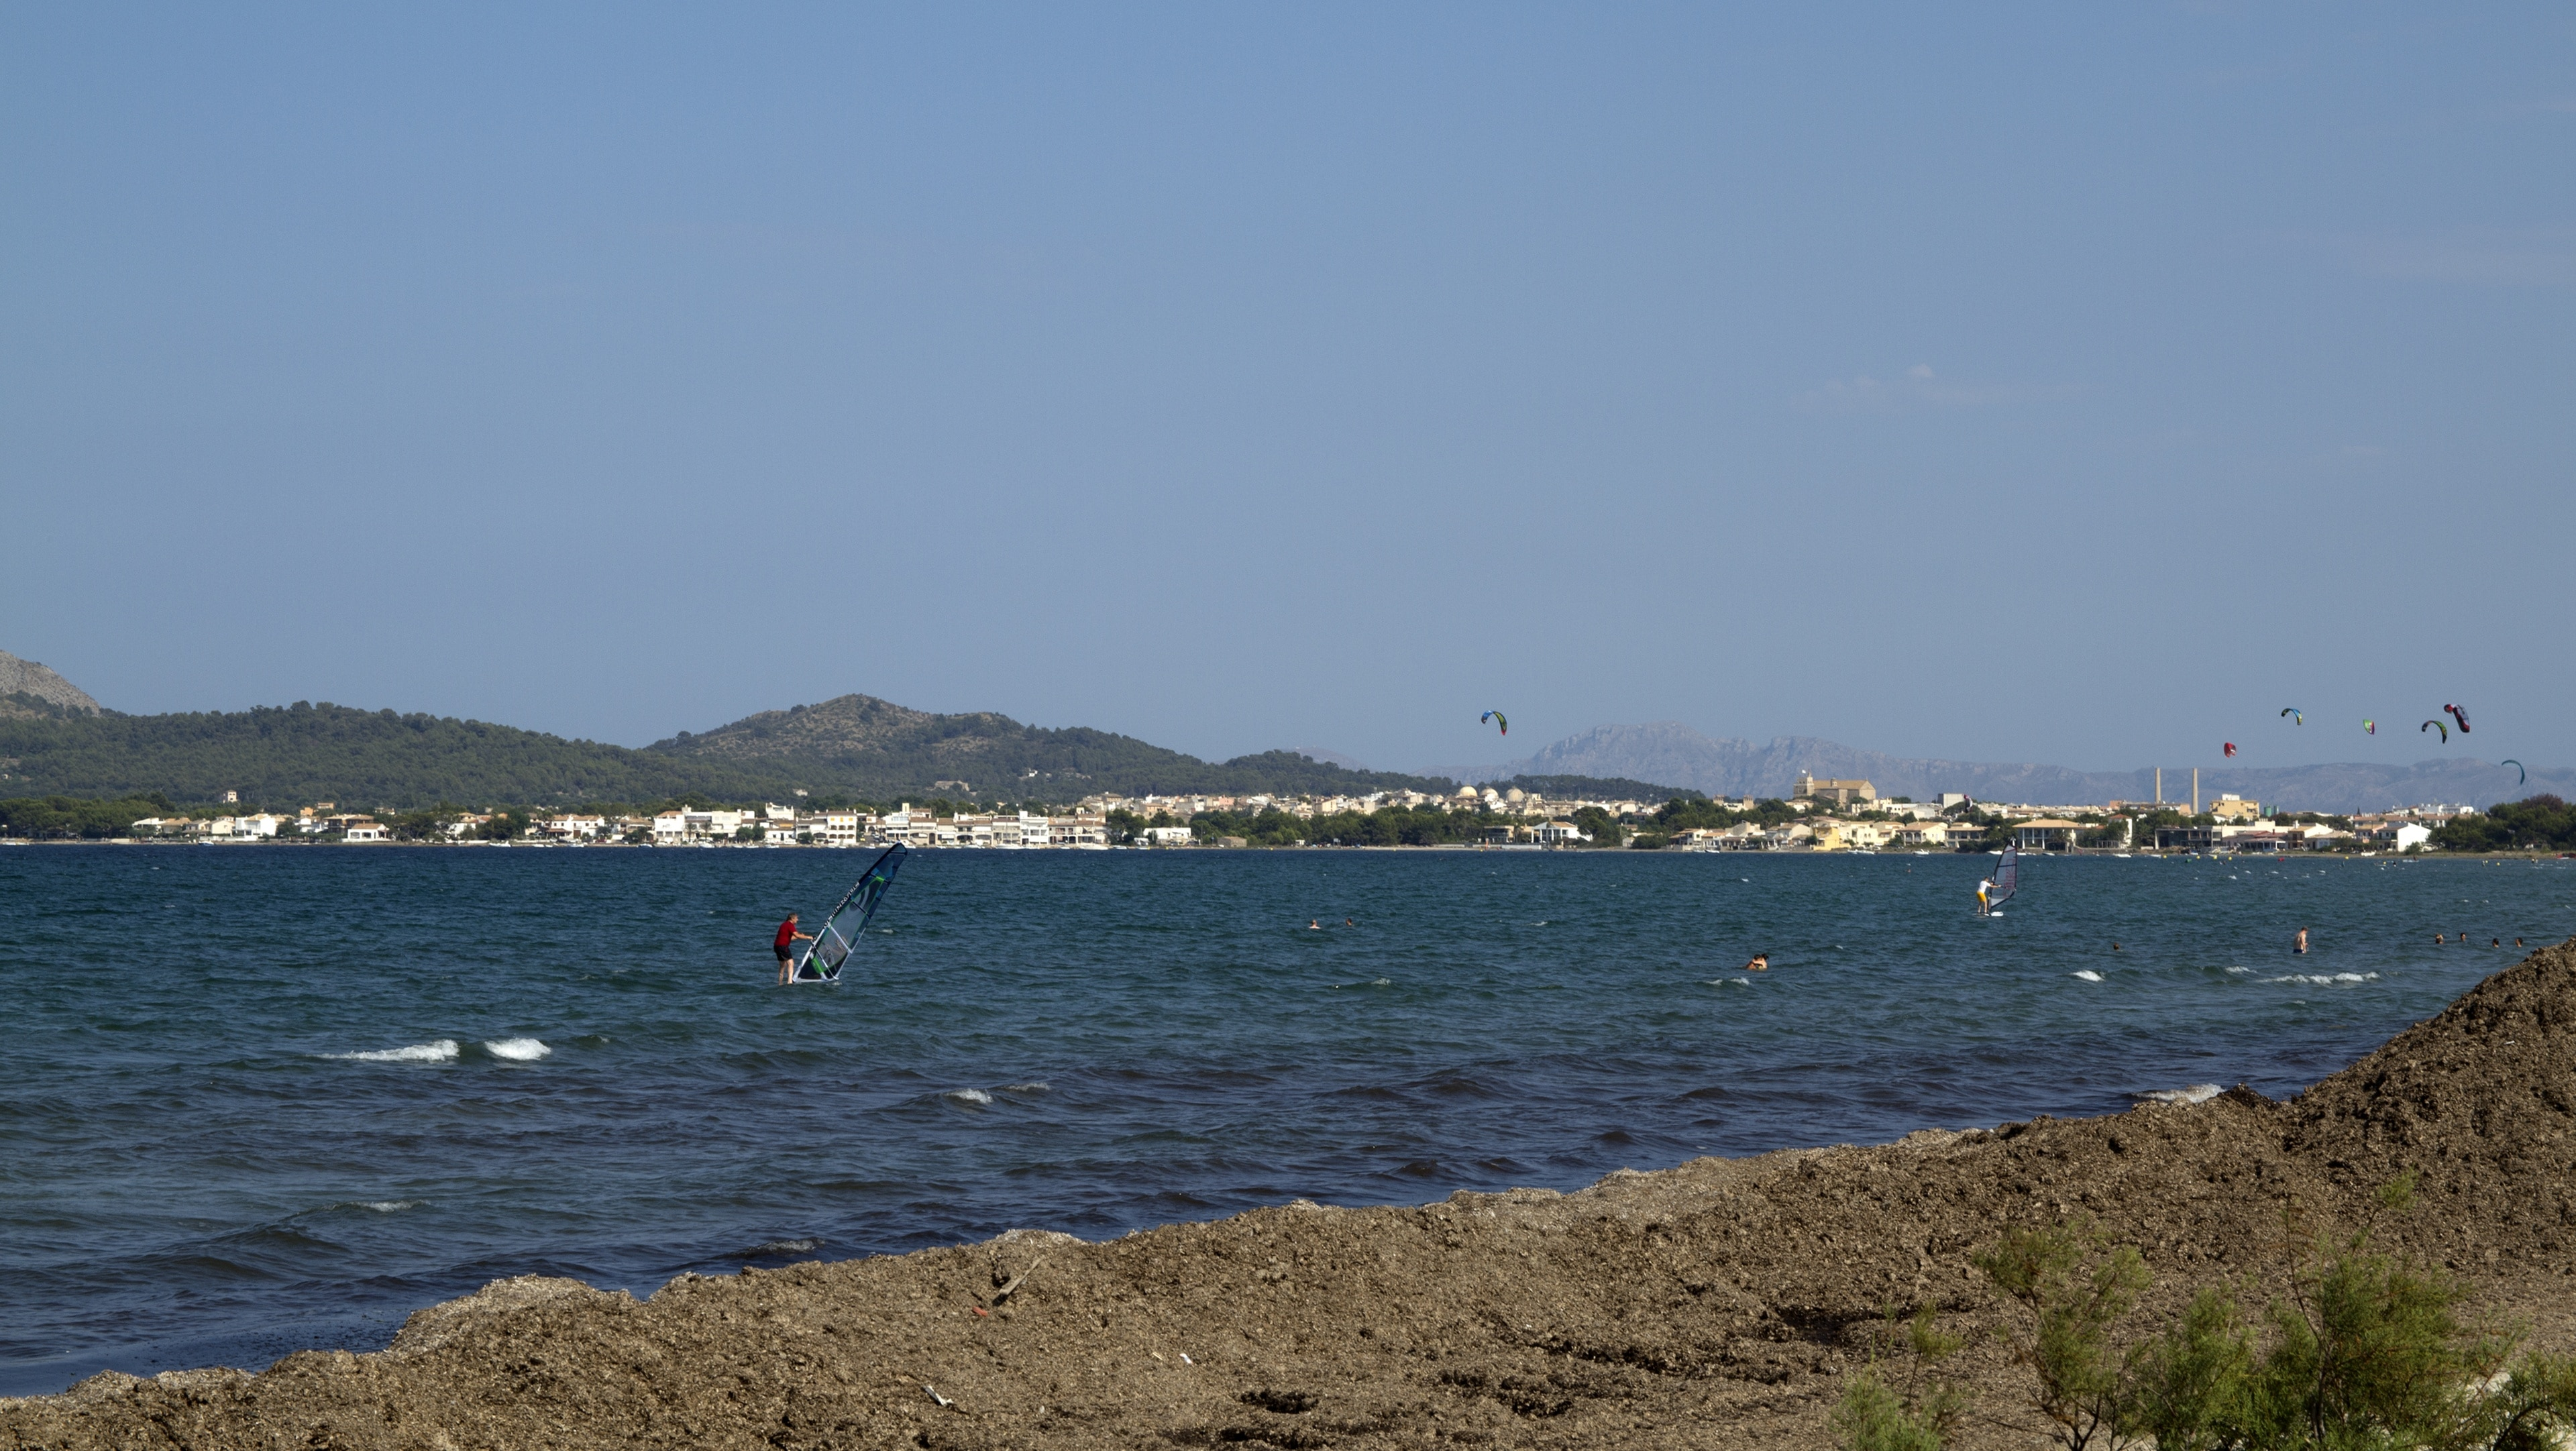 S'Albufereta, Alcudia, Balearic Islands, Spain